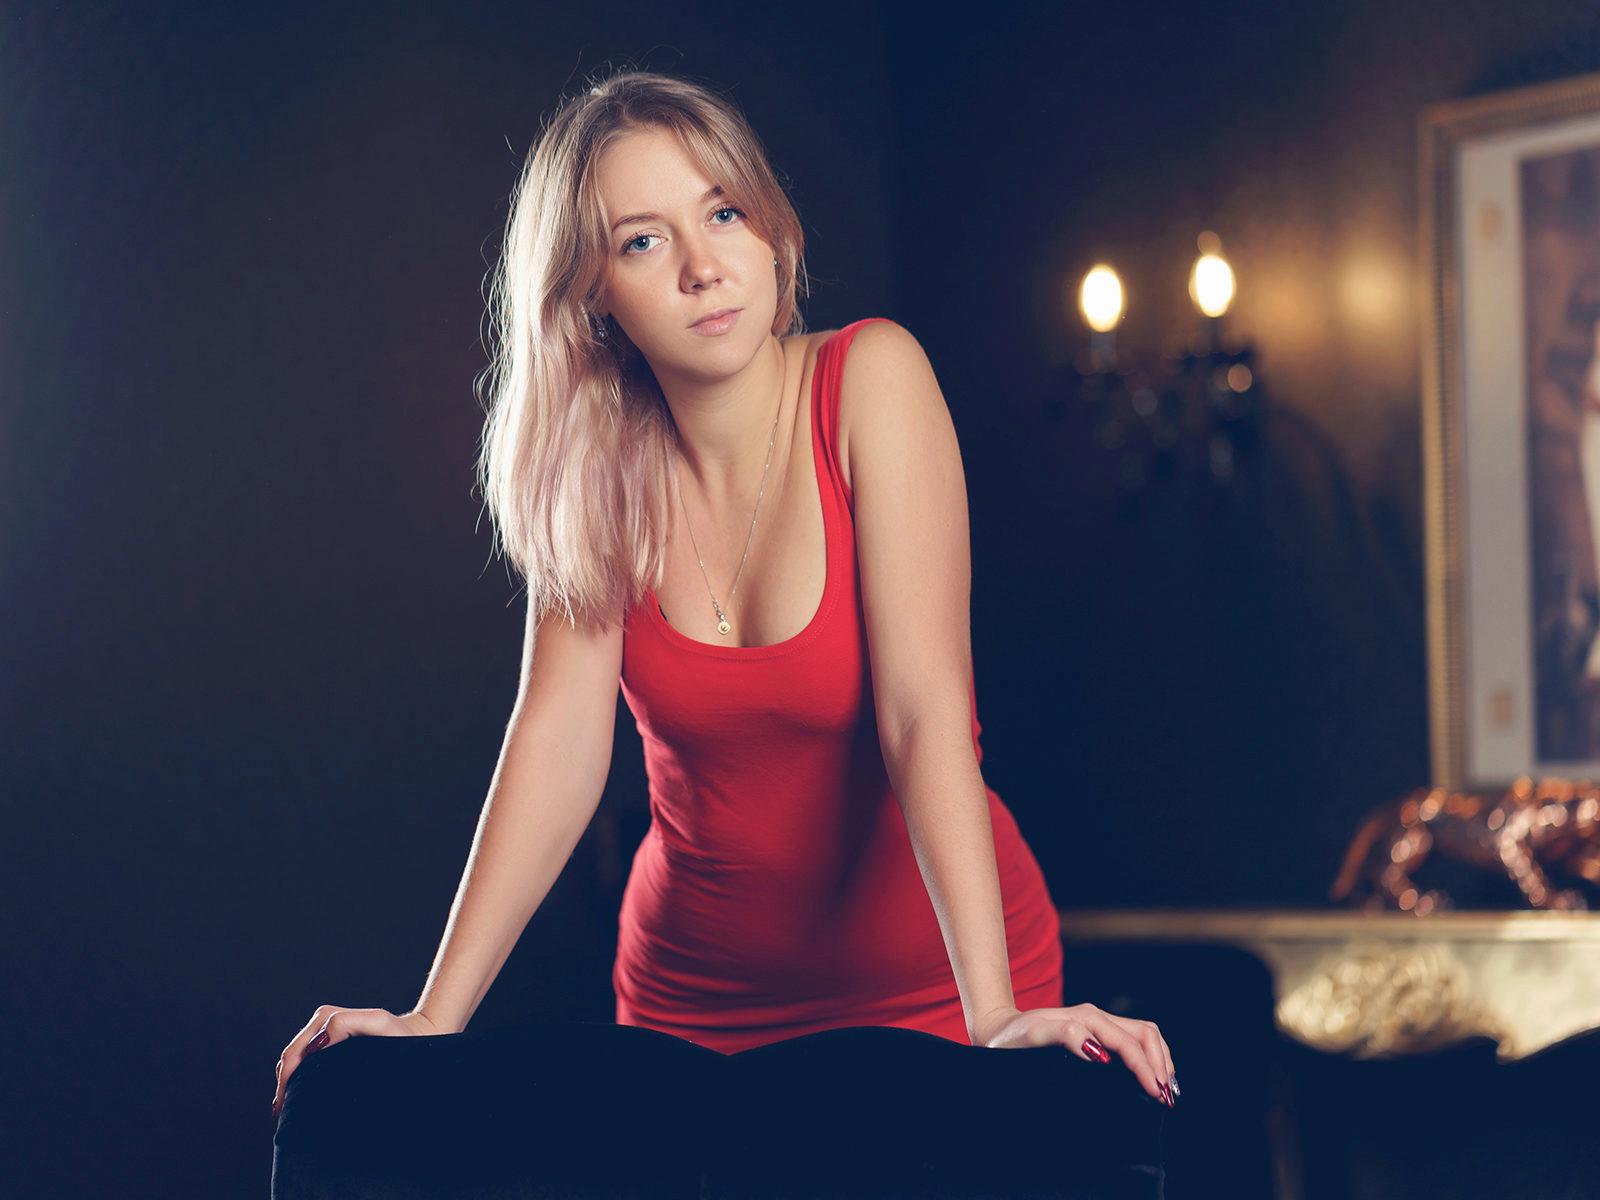 Webcam model Sylvia Duff from WebPowerCam